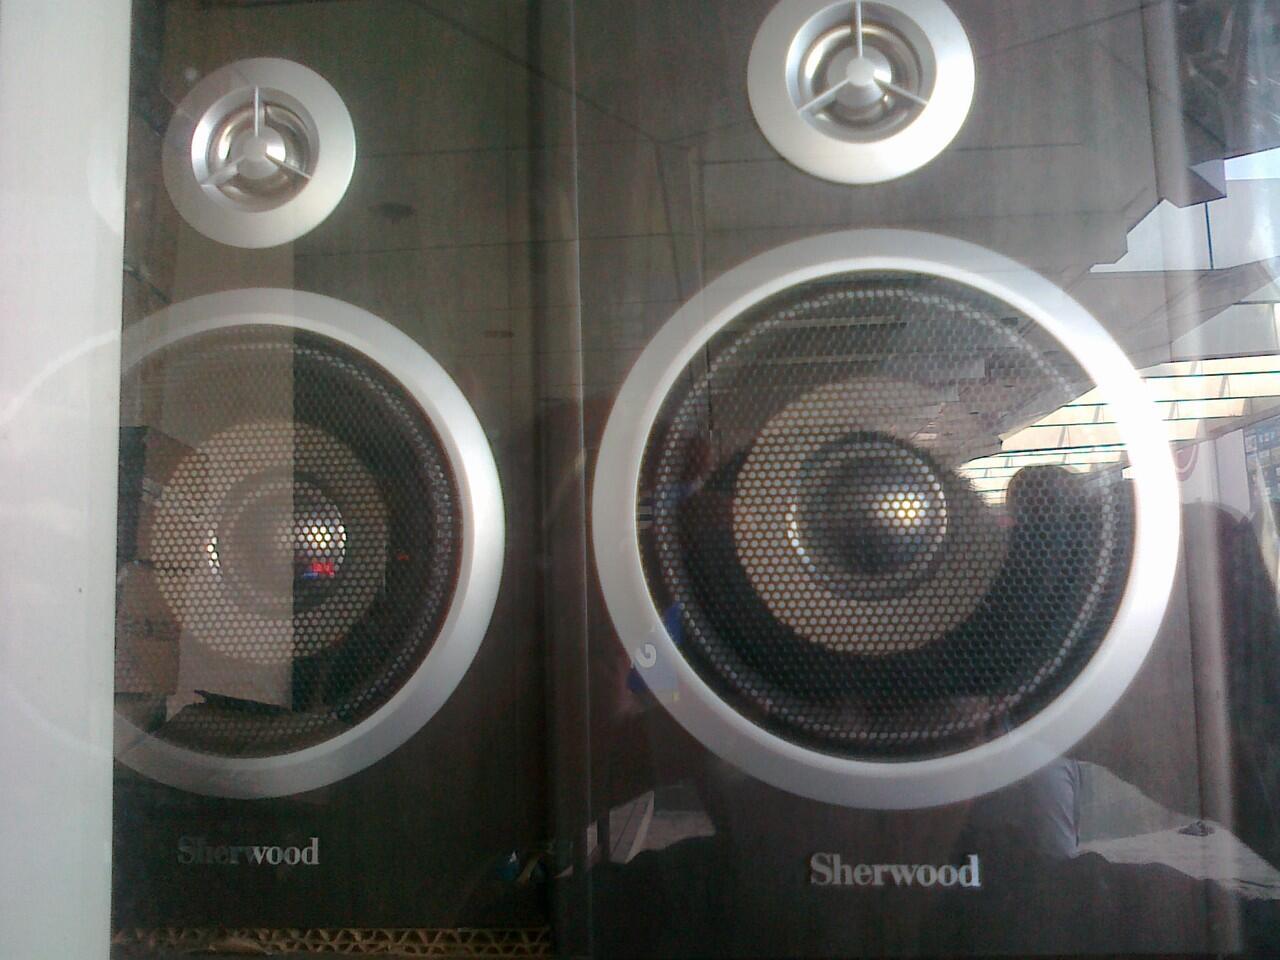 jual speaker sherwood 4108